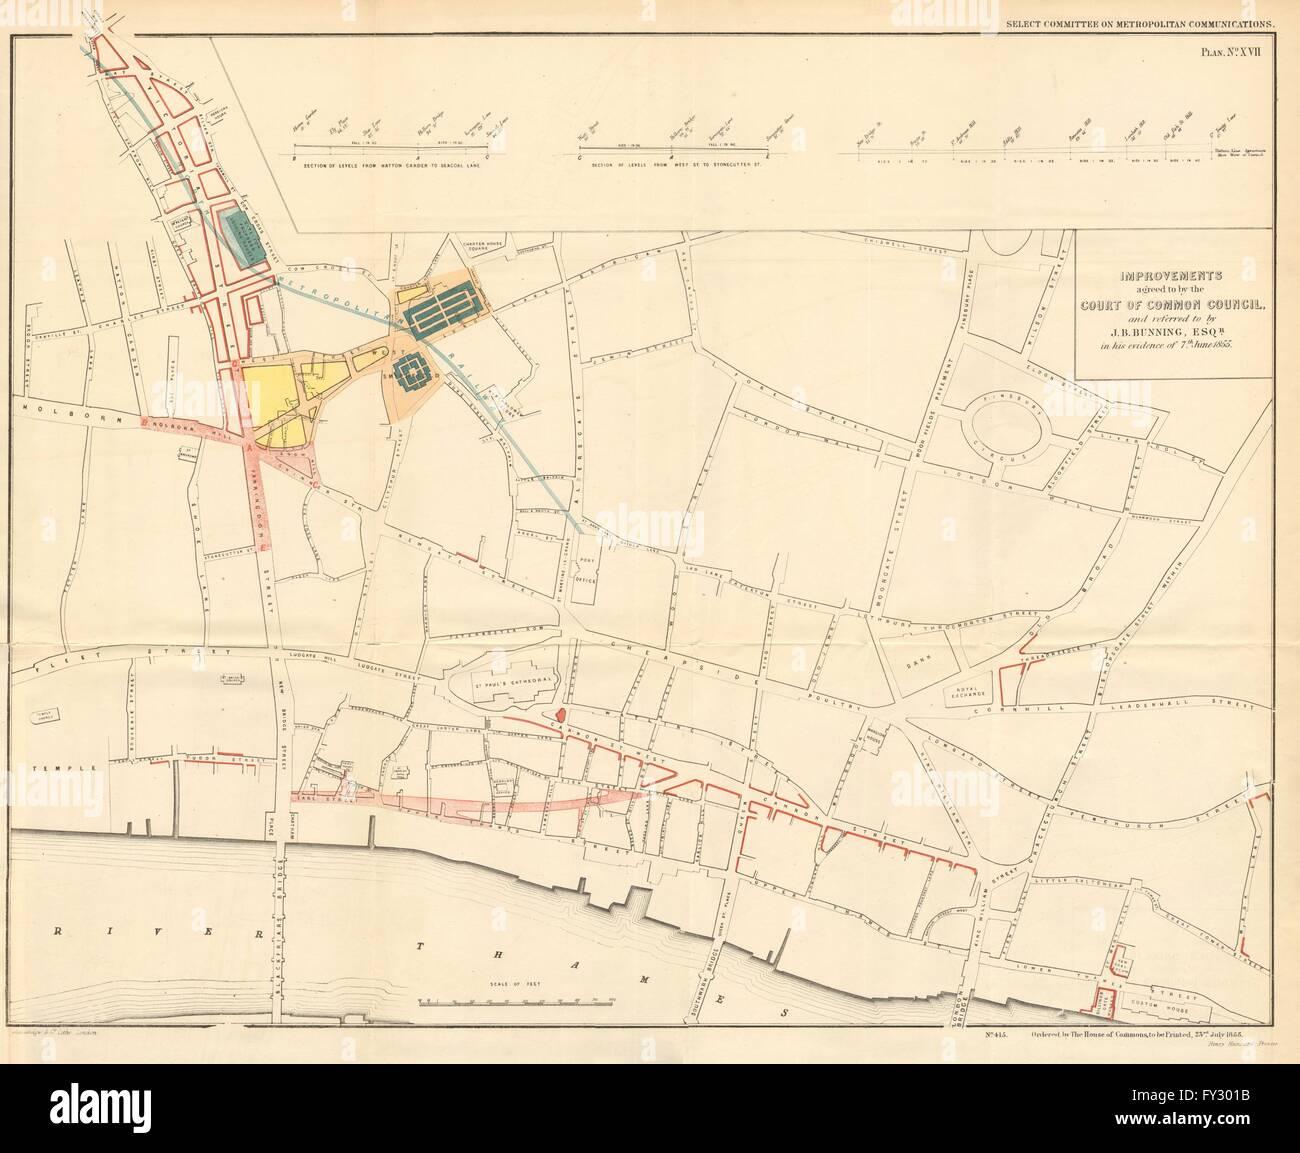 CITY OF LONDON Queen Victoria StreetFarringdon Road plans BUNNING